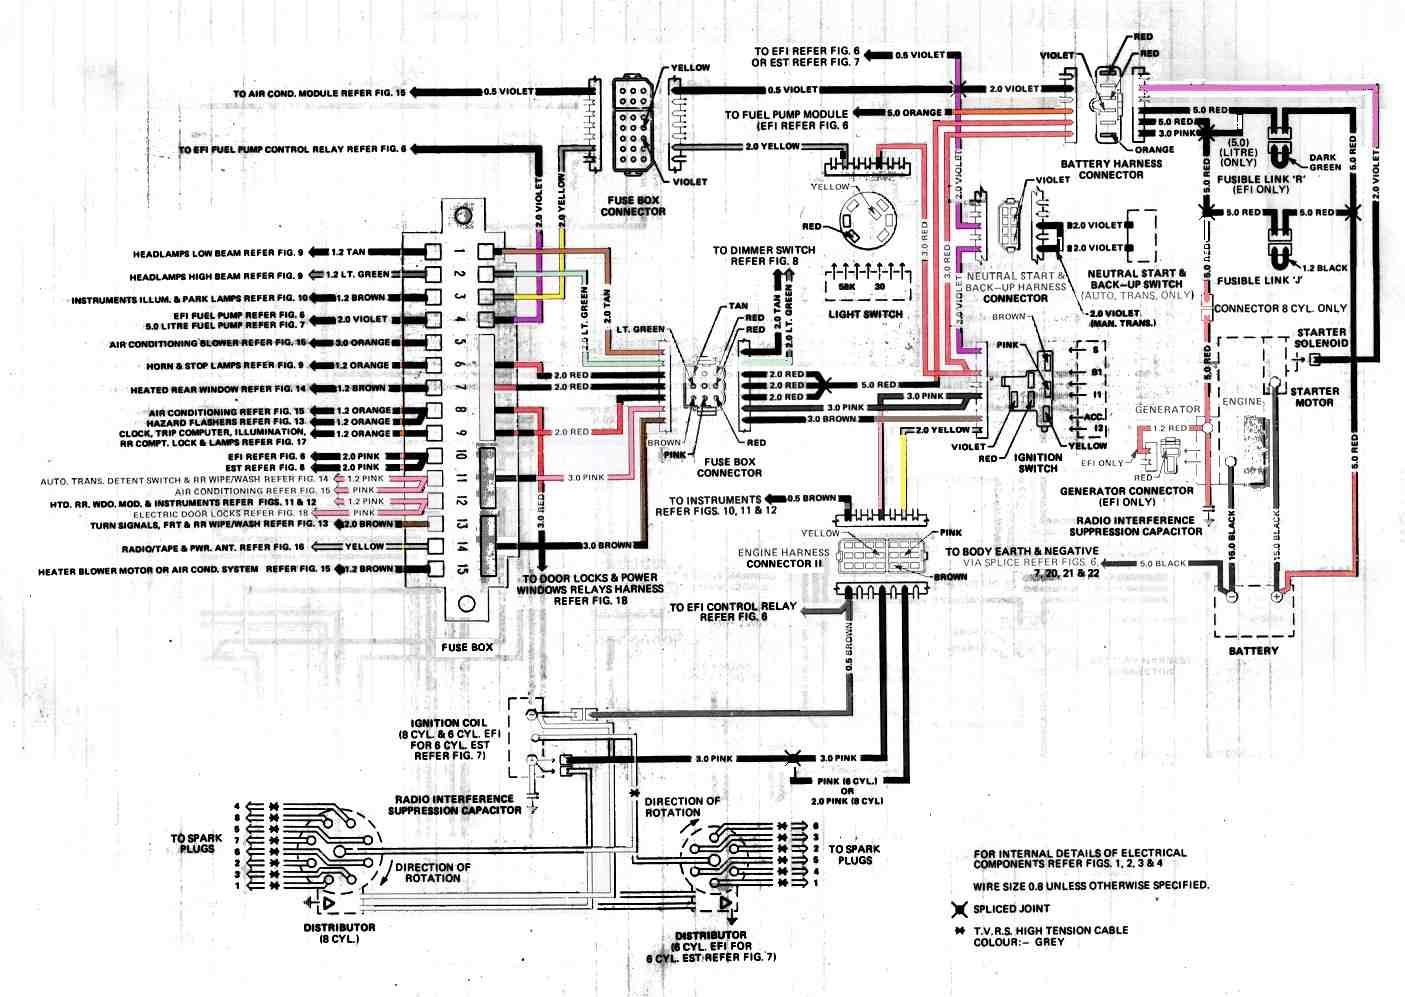 Fpv Vector Wiring Boat Wiring Schematics - Wiring Diagrams